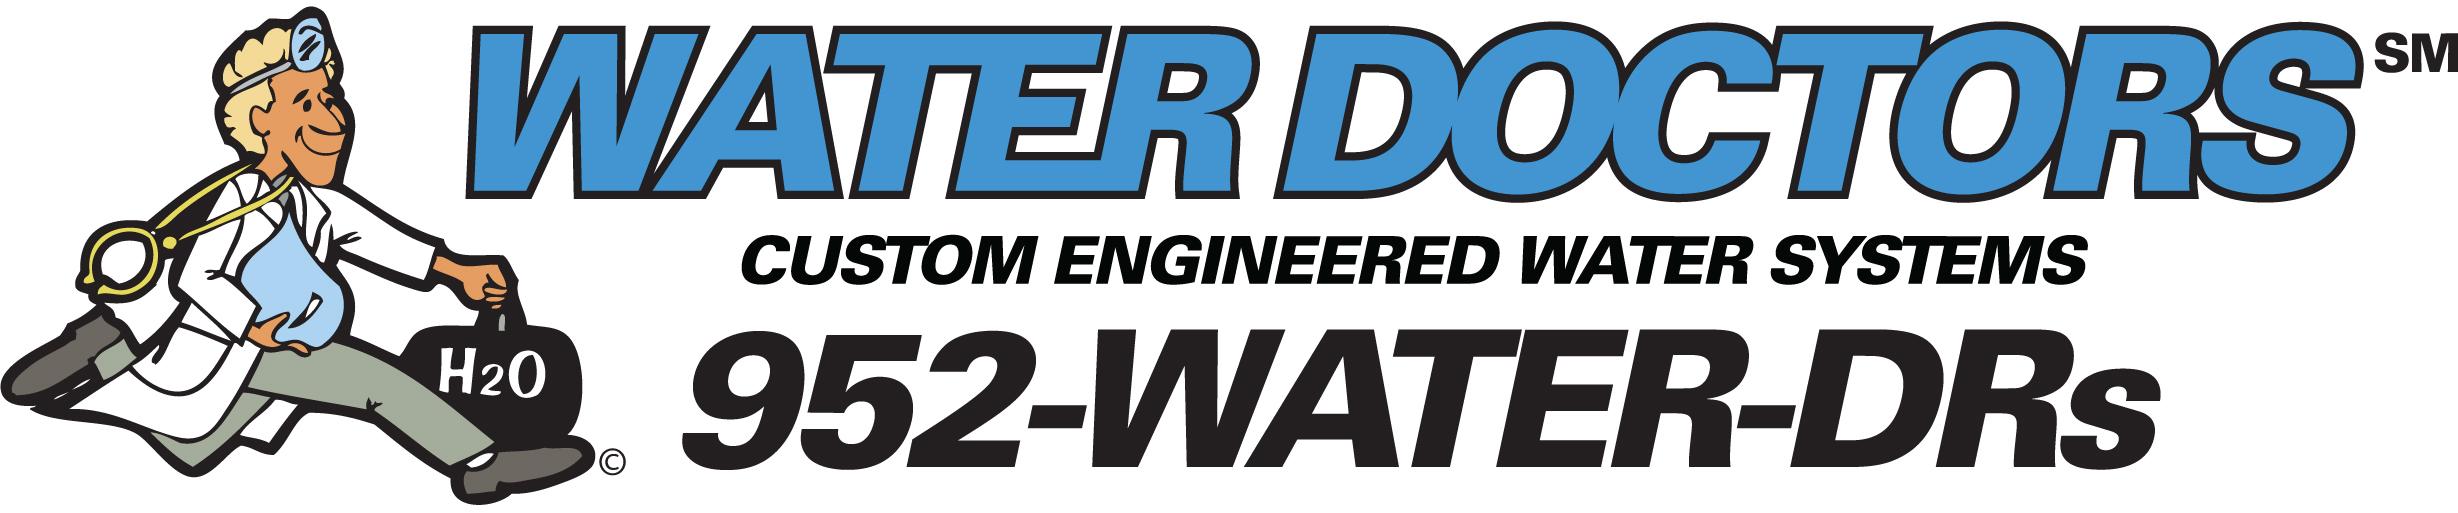 Water Doctors Water Treatment